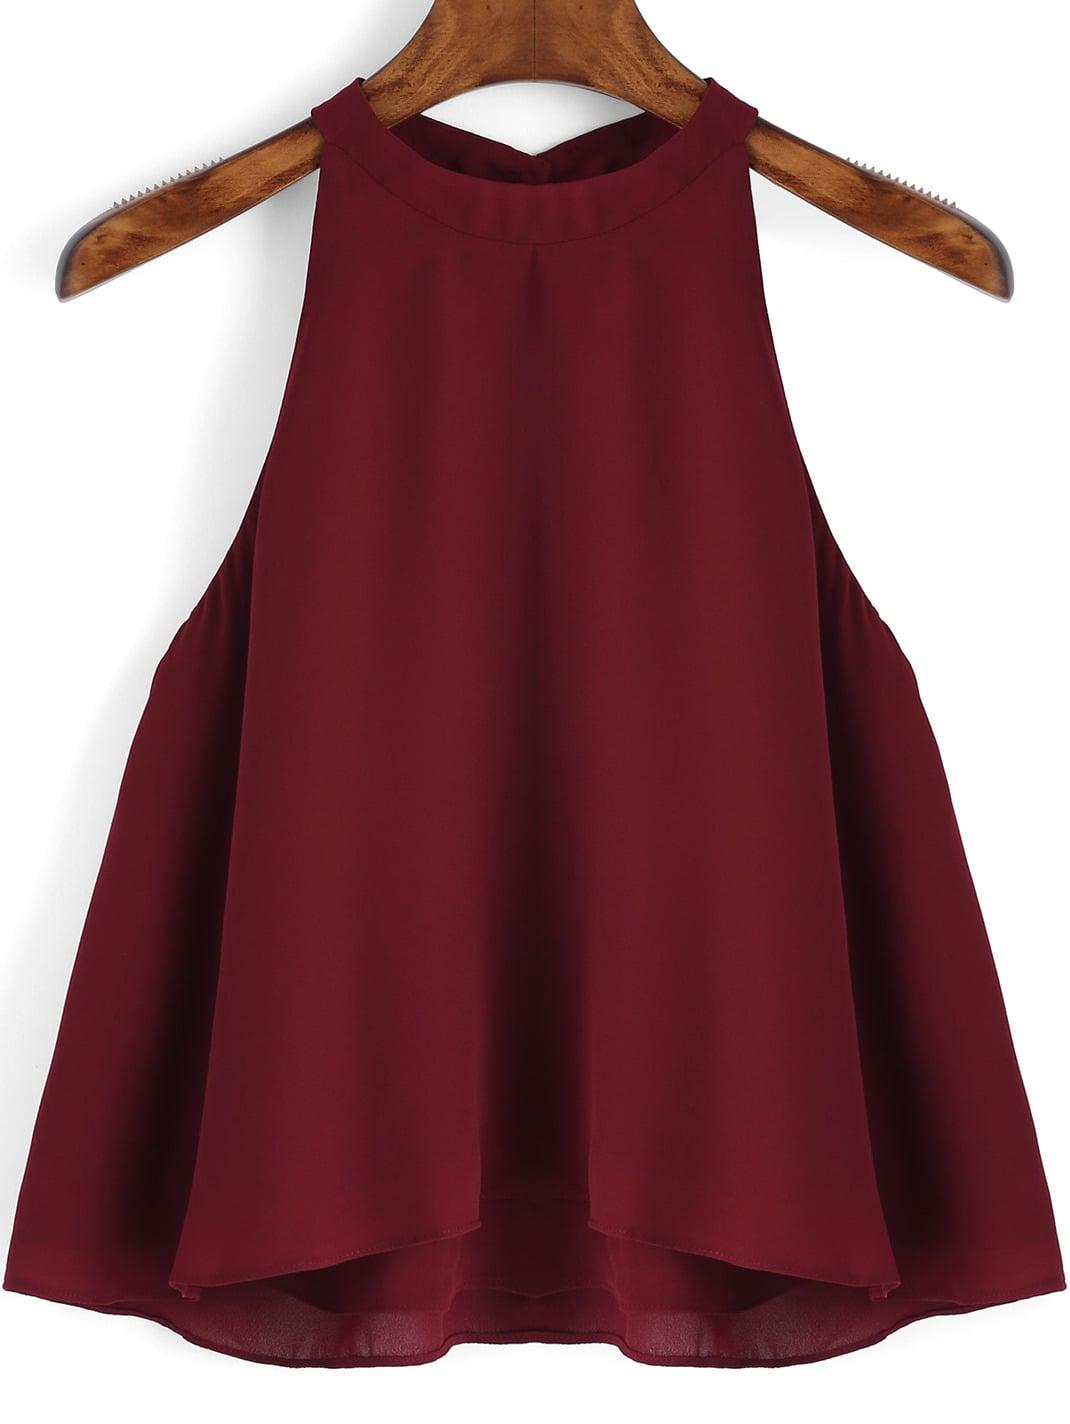 Burgundy Loose Cami Top vest151105051